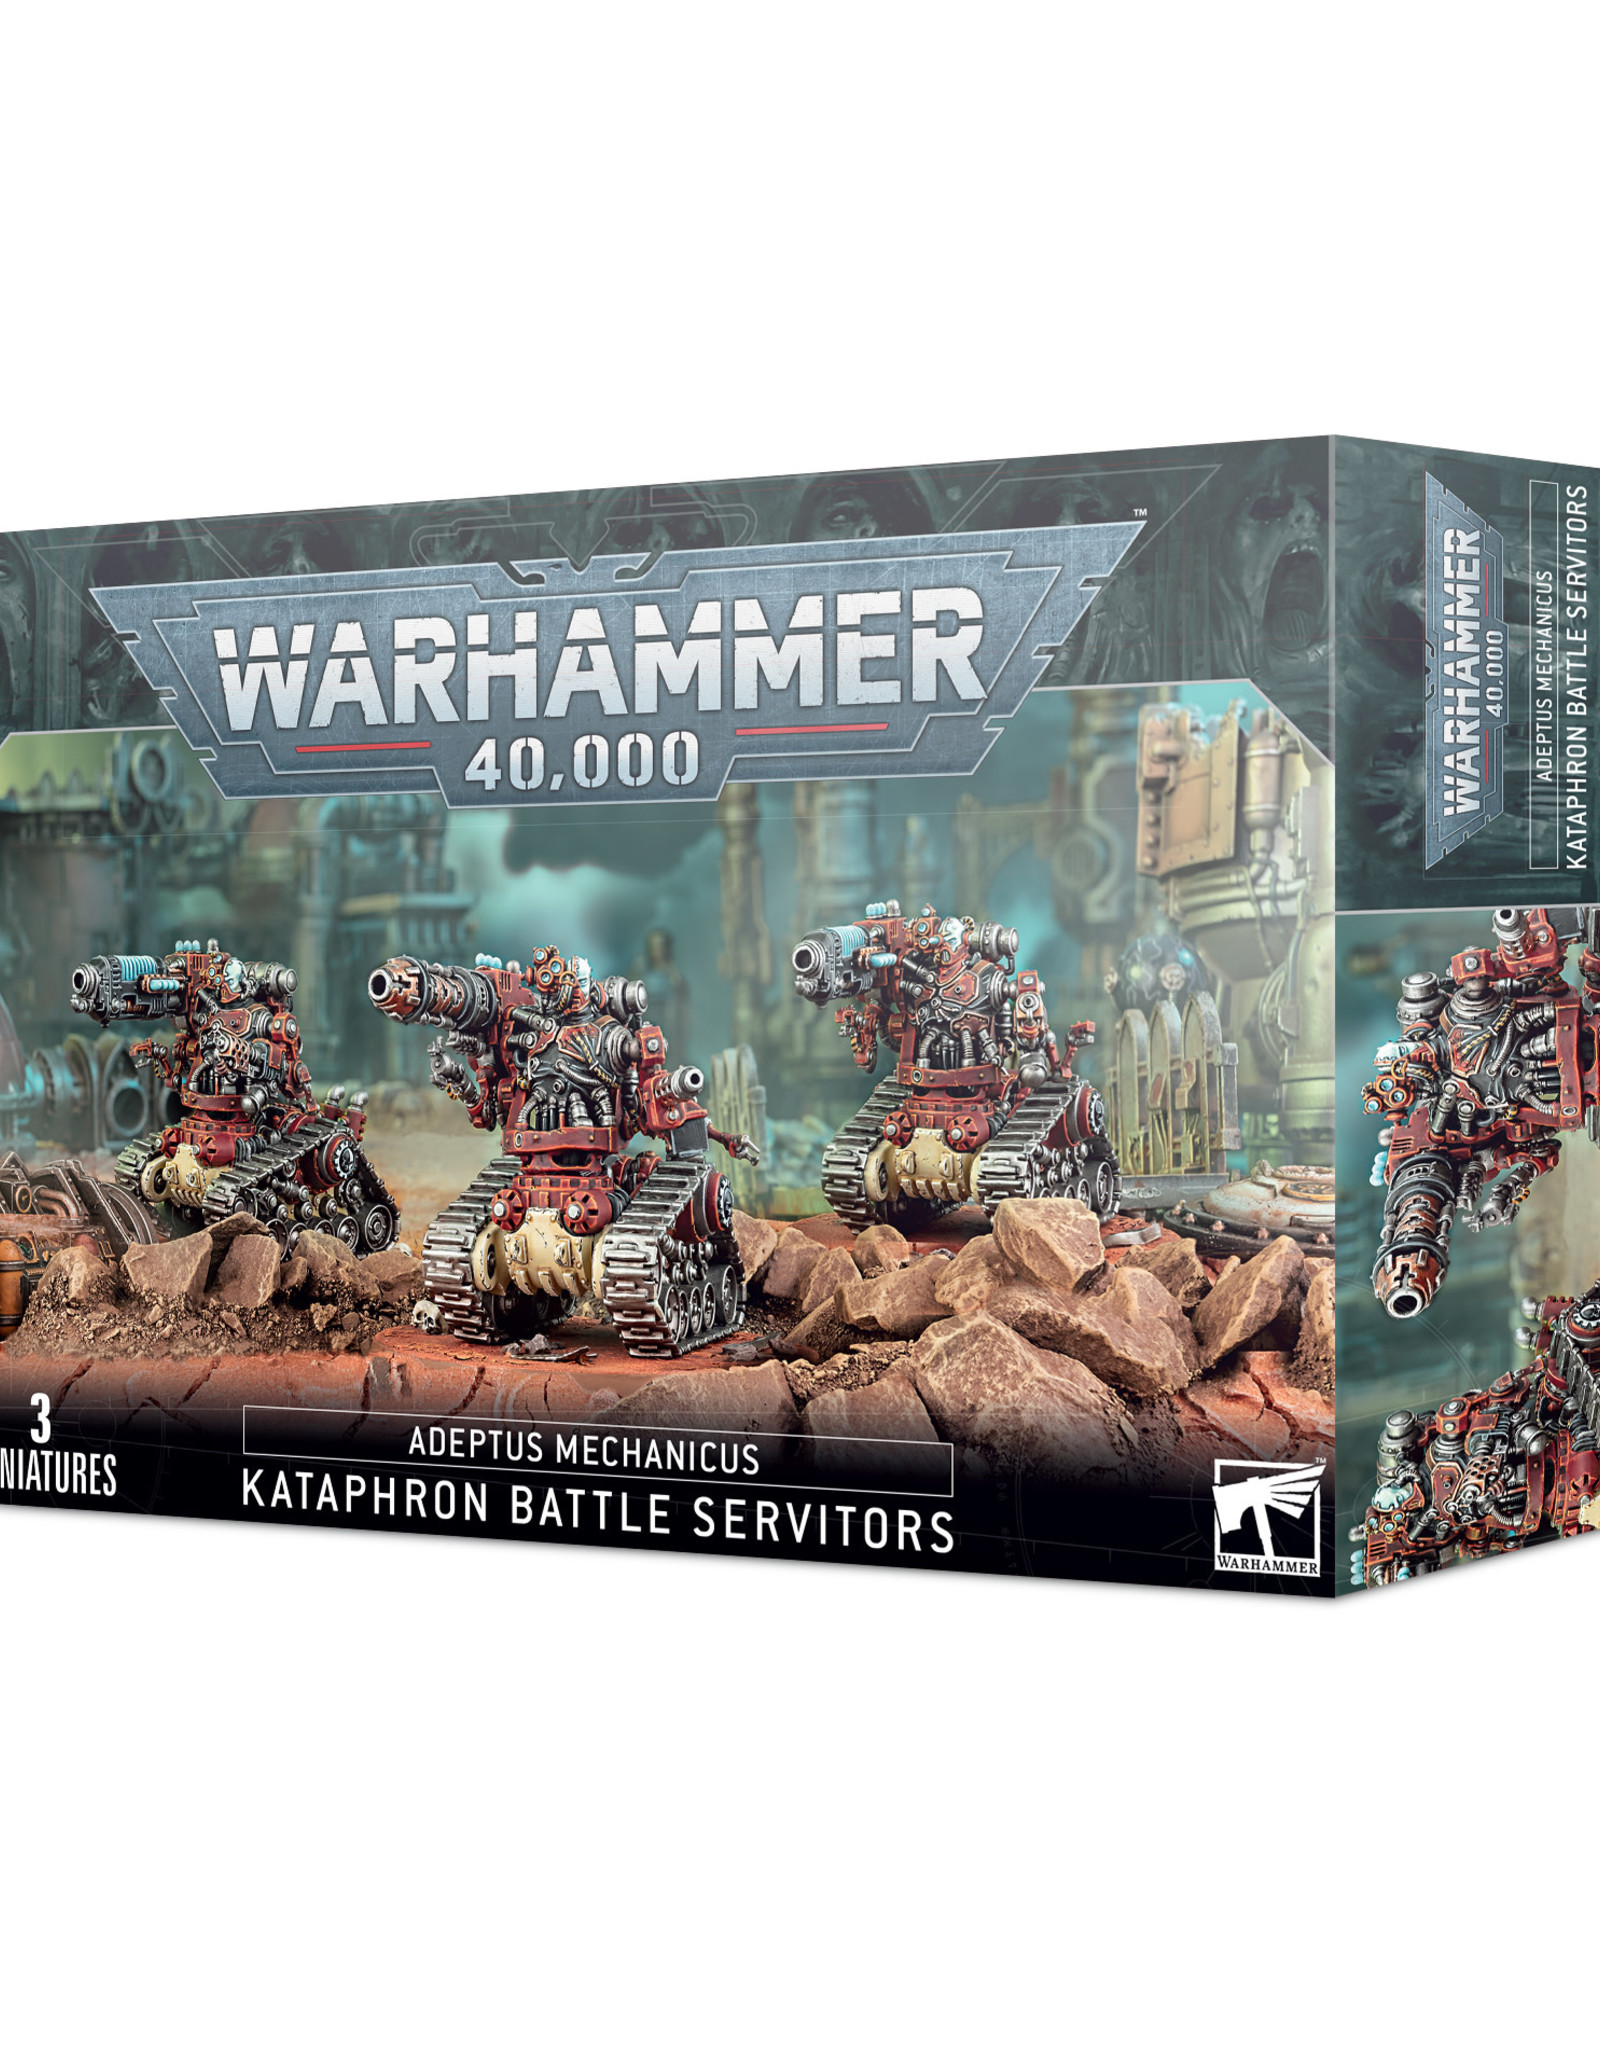 Games Workshop Warhammer 40K ADEPTUS MECH. KATAPHRON BATTLE SERVITORS